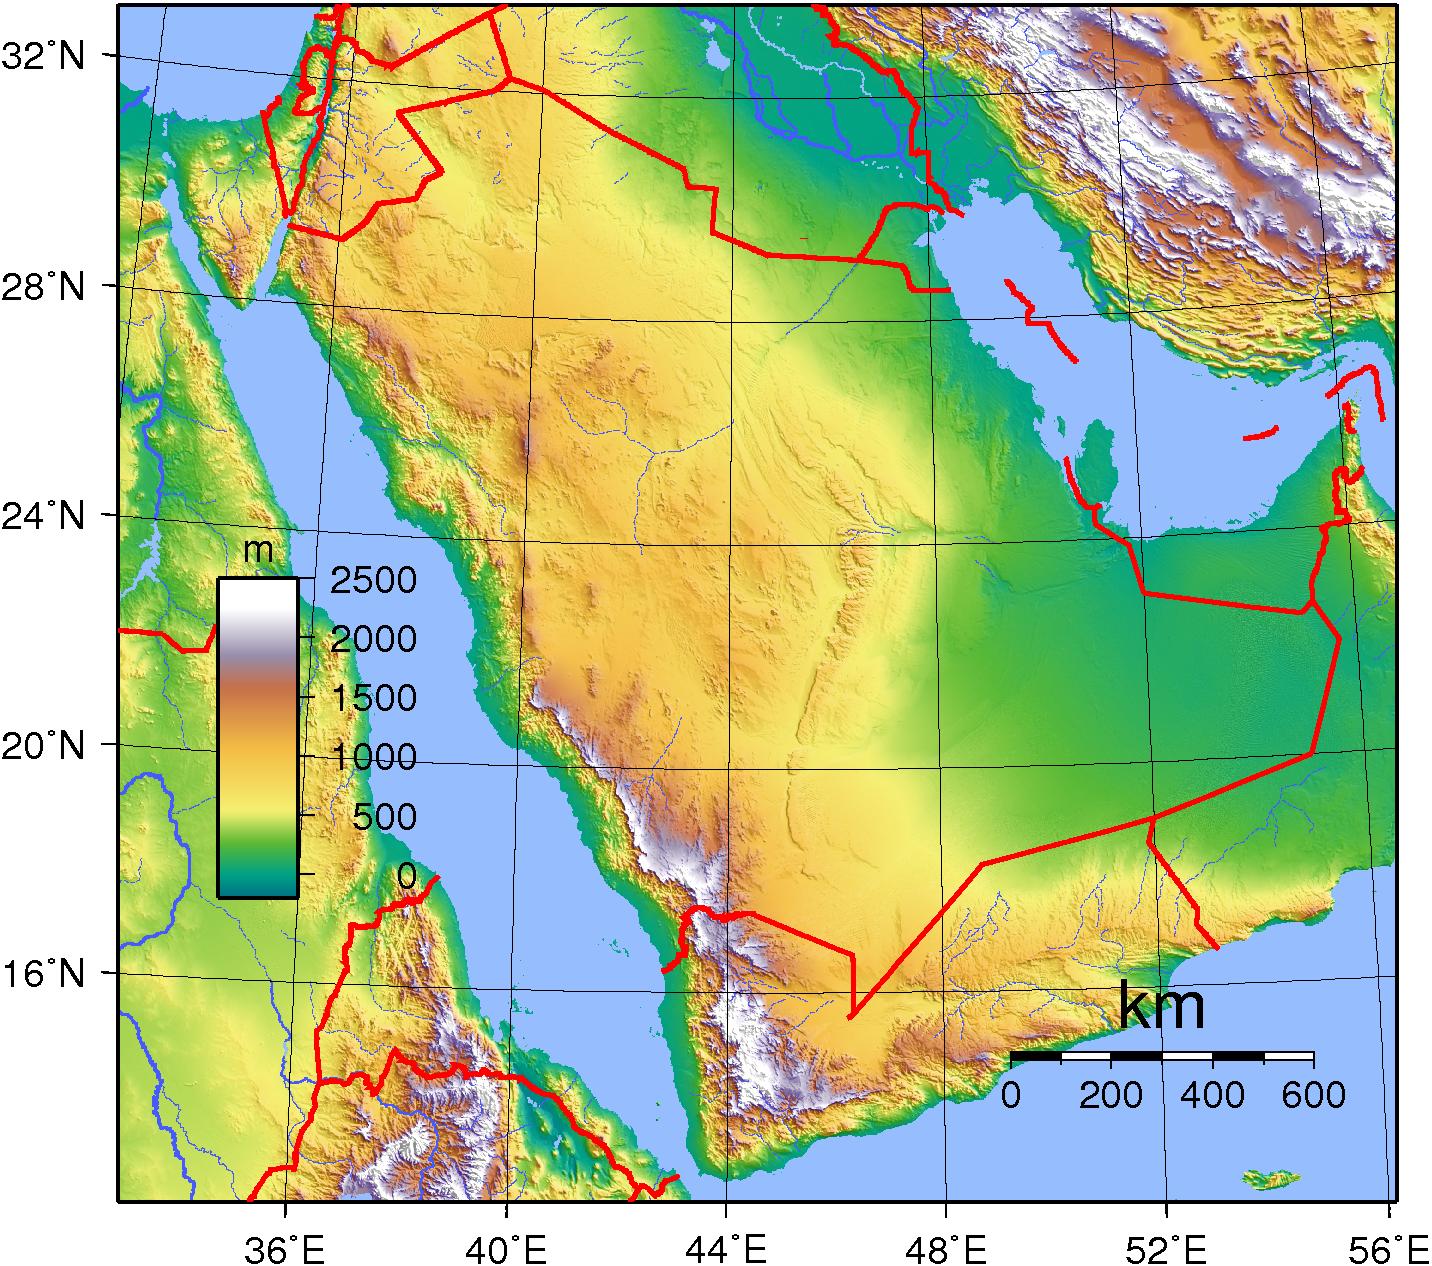 Saudi_Arabia_Topography.png